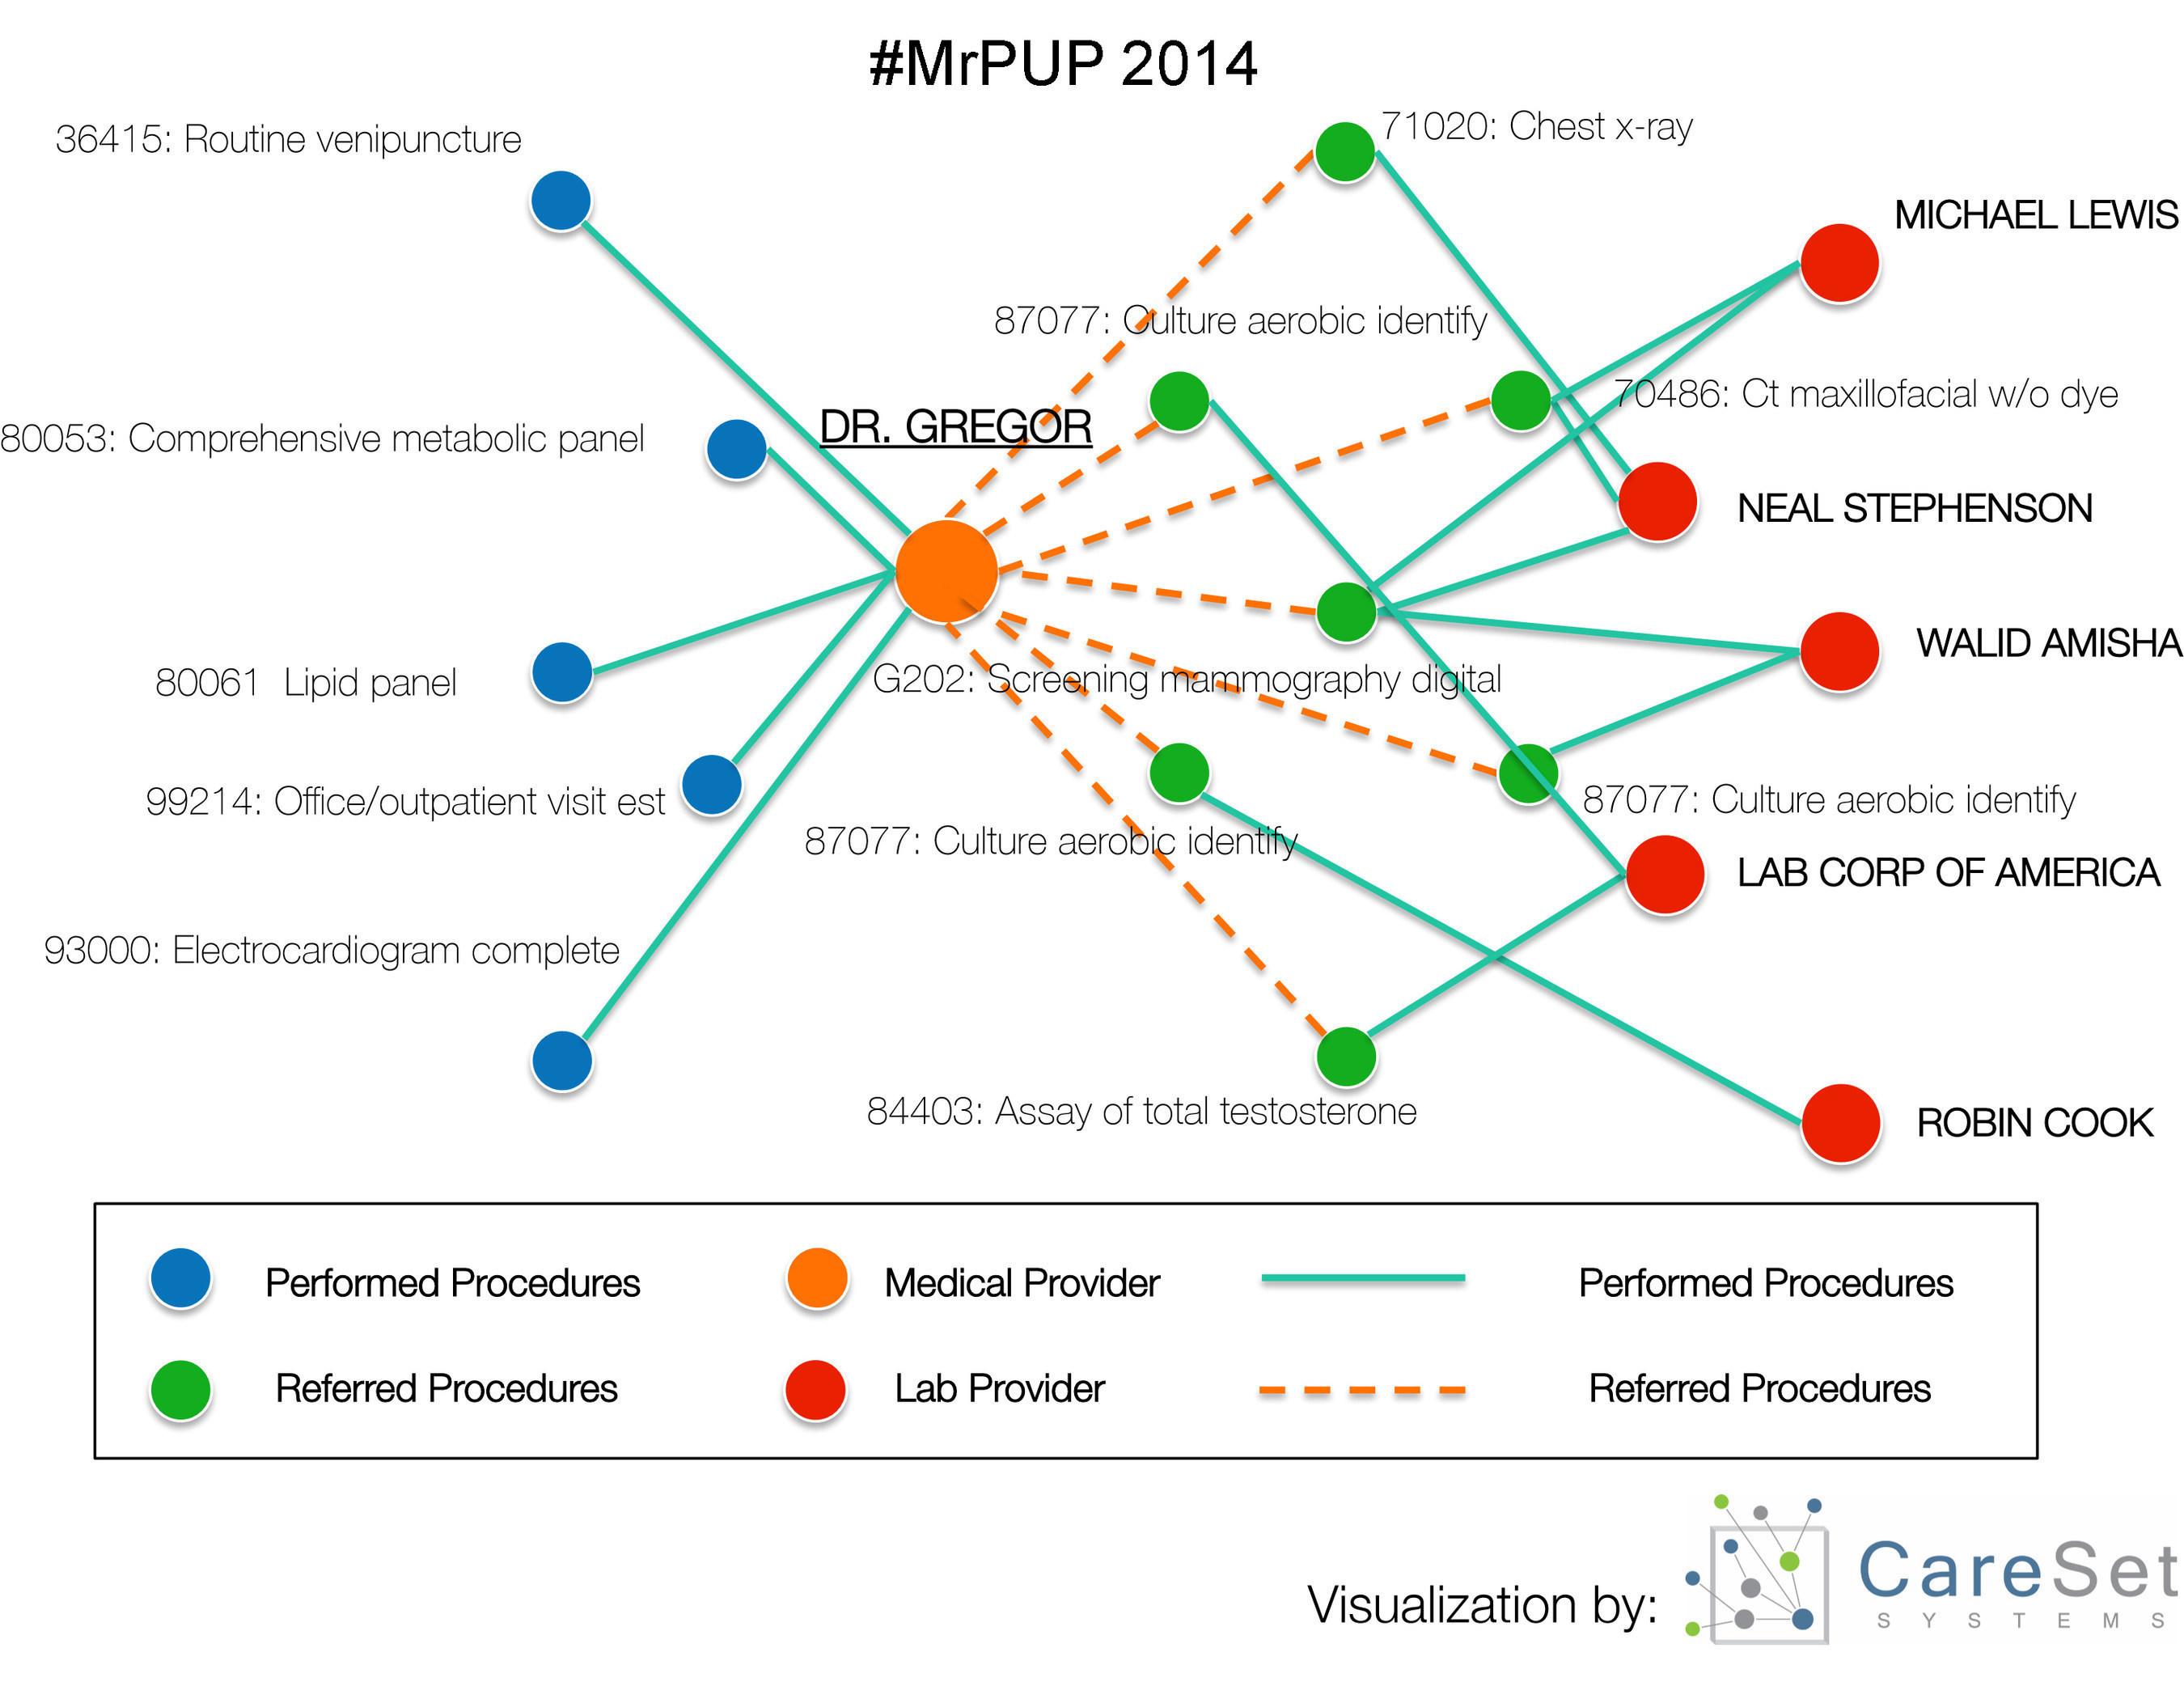 2014 Medicare Referring Provider Utilization for Procedures (MrPUP) Dataset